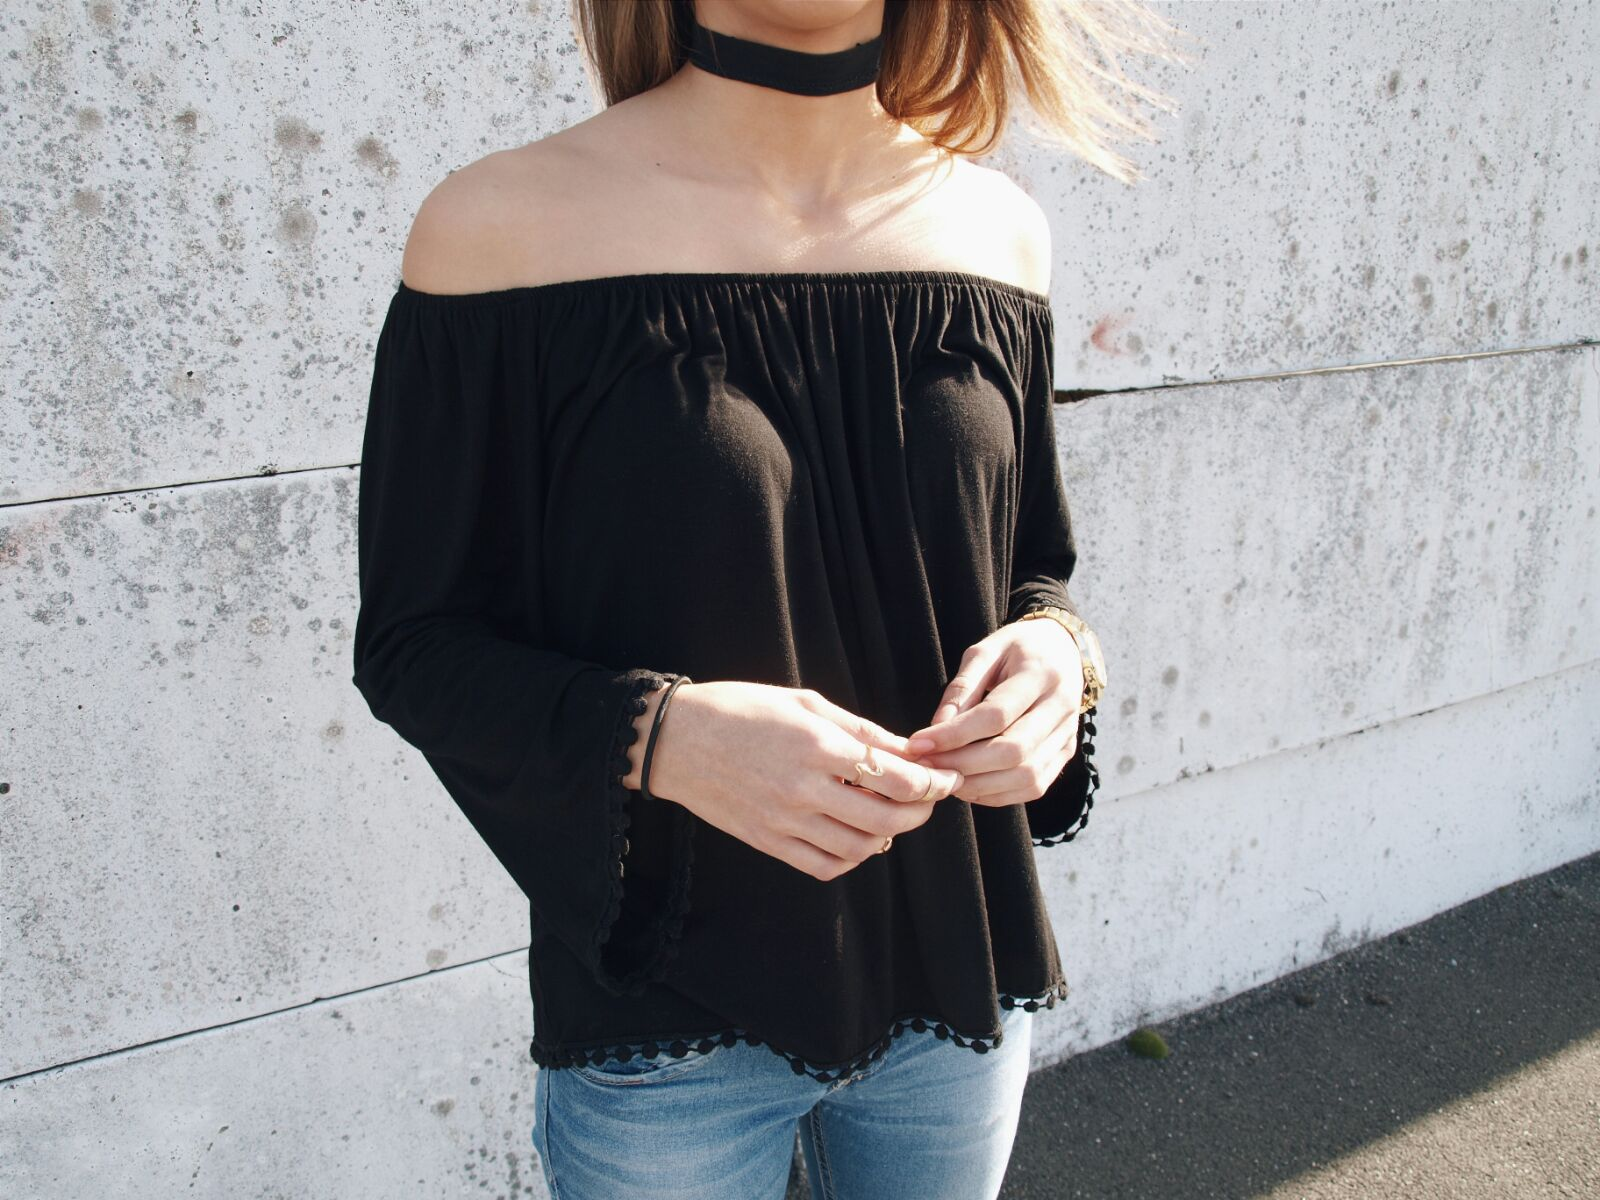 coastalandco-hendaye-blog-blogger-fashion-beauty-lifestyle-moda-mode-belleza-blue-jeans-destroy-derbies-black-shoes-girl-zara-cachecache-dark-x-denim